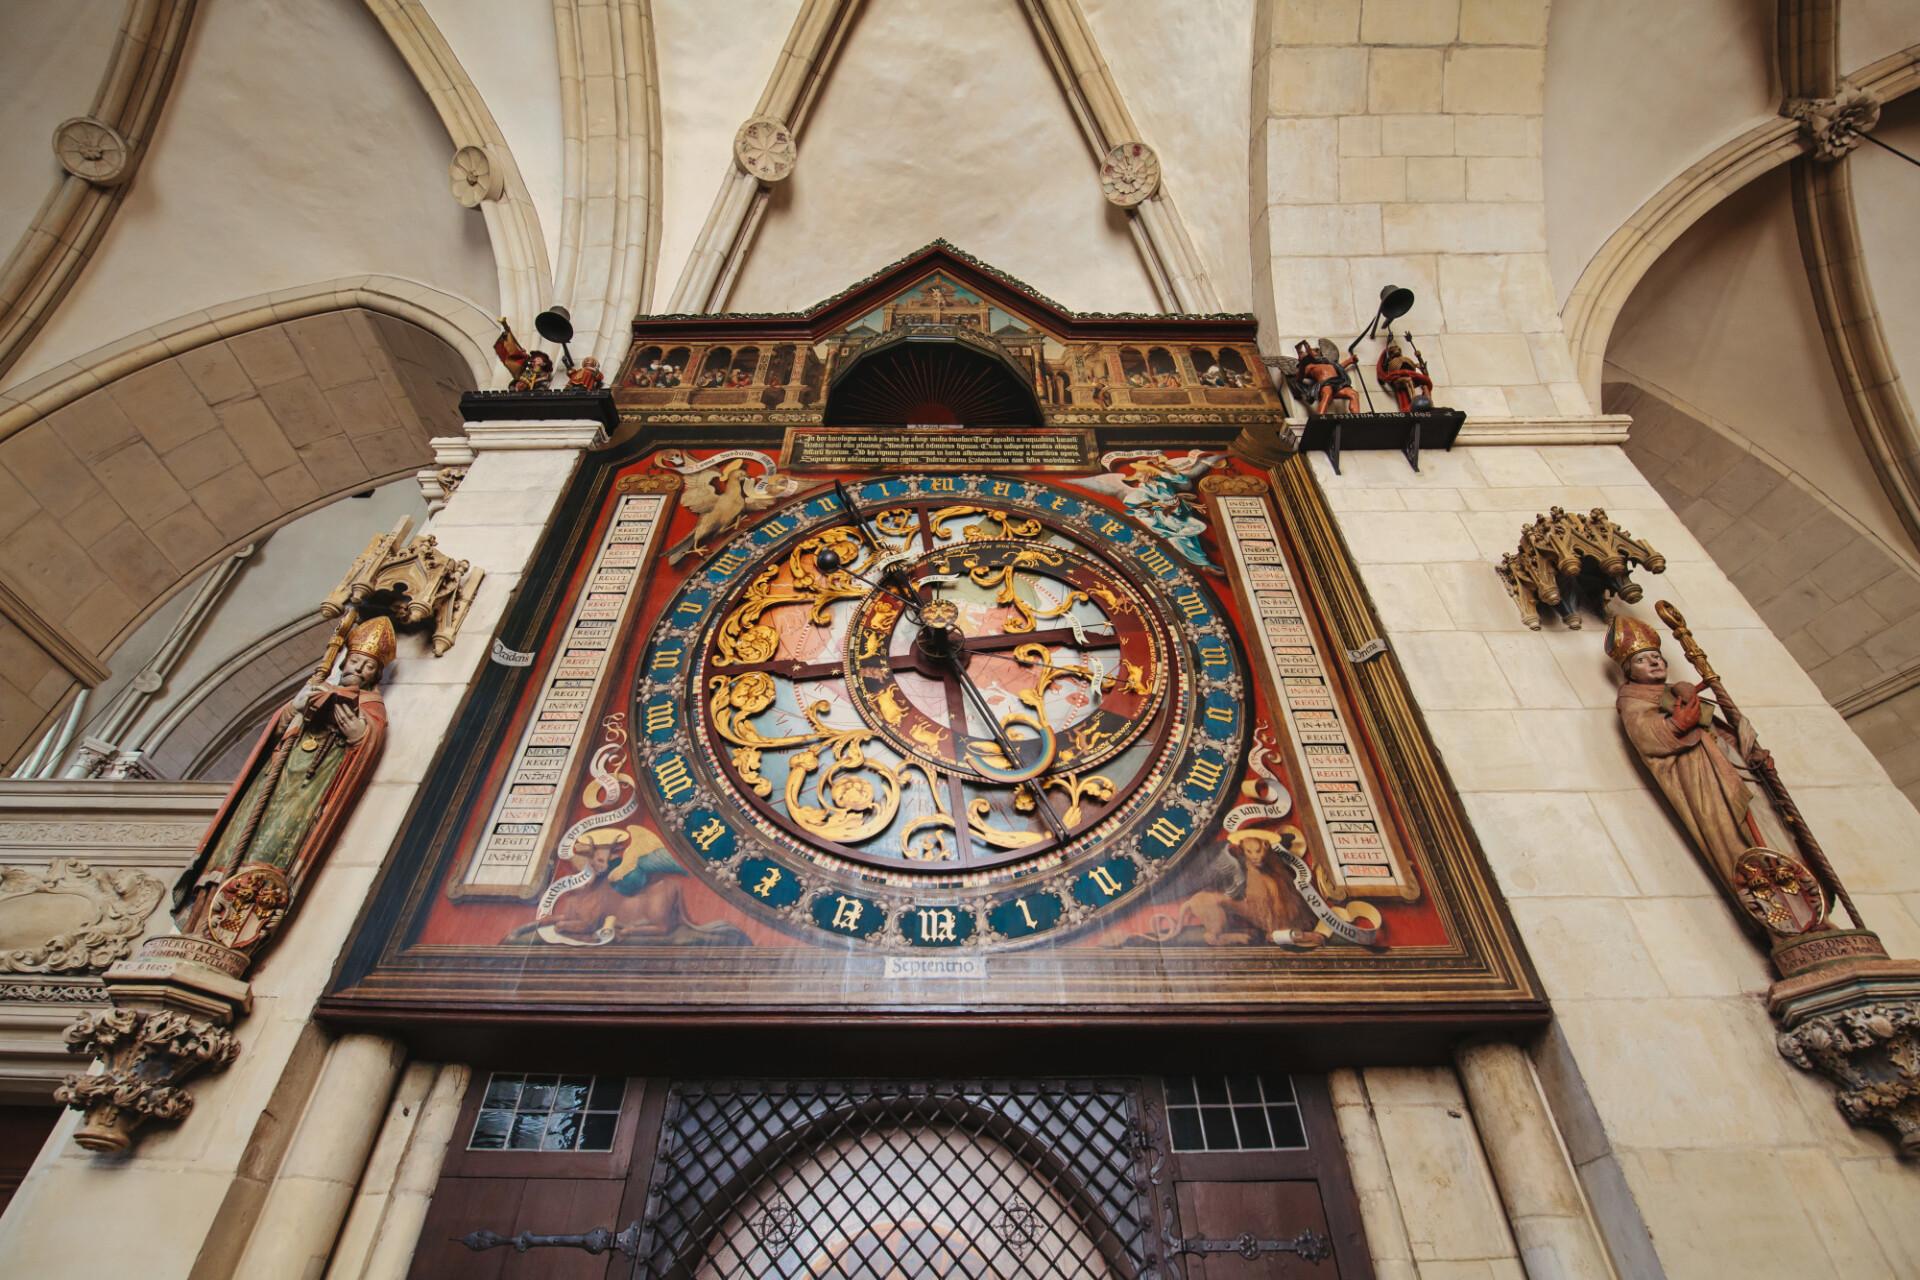 Imposing antique clock in a church